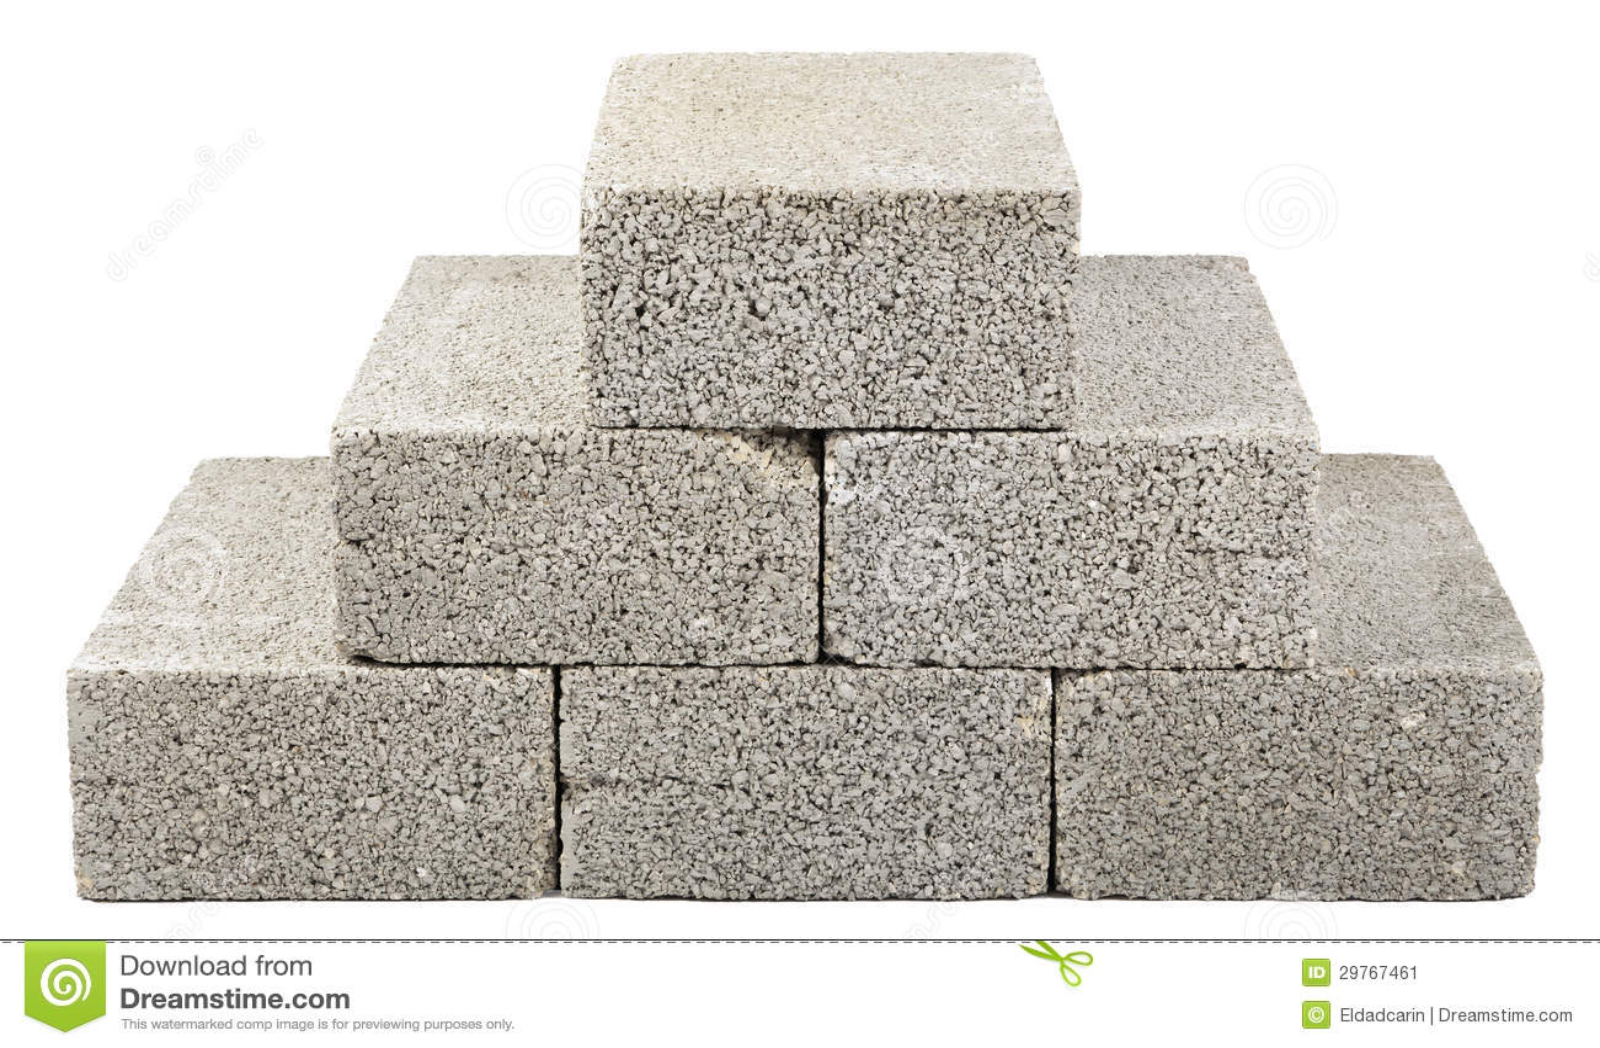 Construction Blocks Pyramid Stock Image - Image of cement